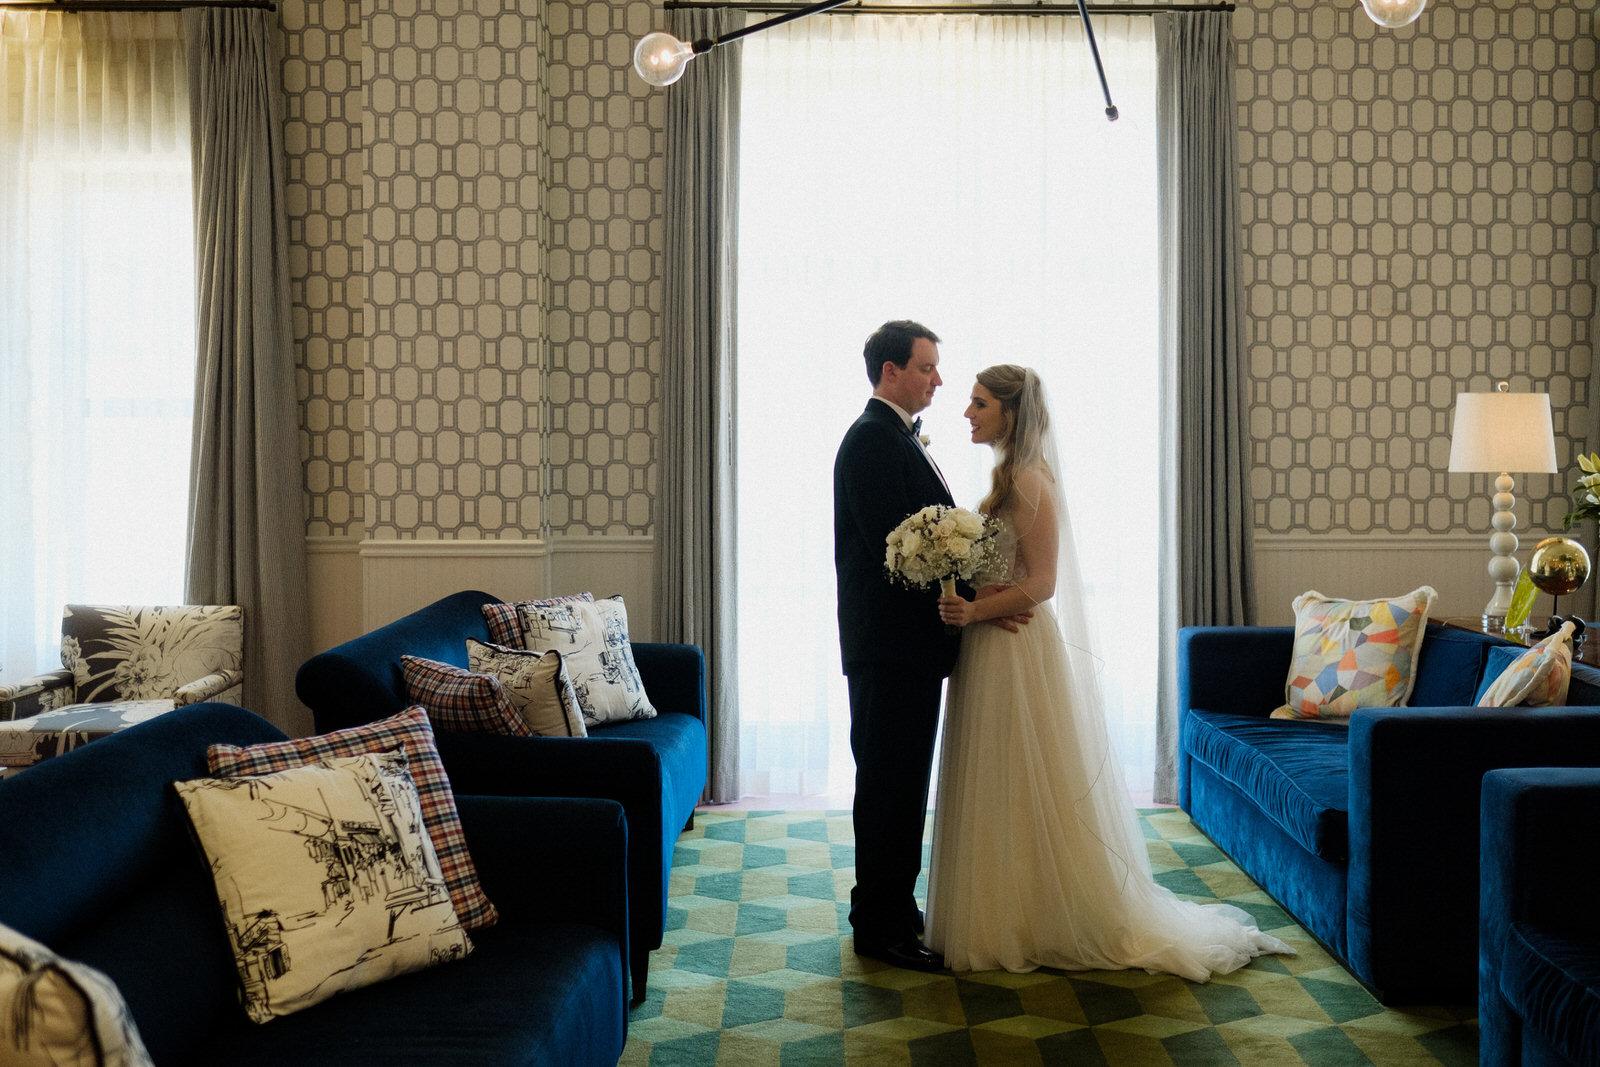 Oxford_Mississippi_wedding_photographer_16.JPG